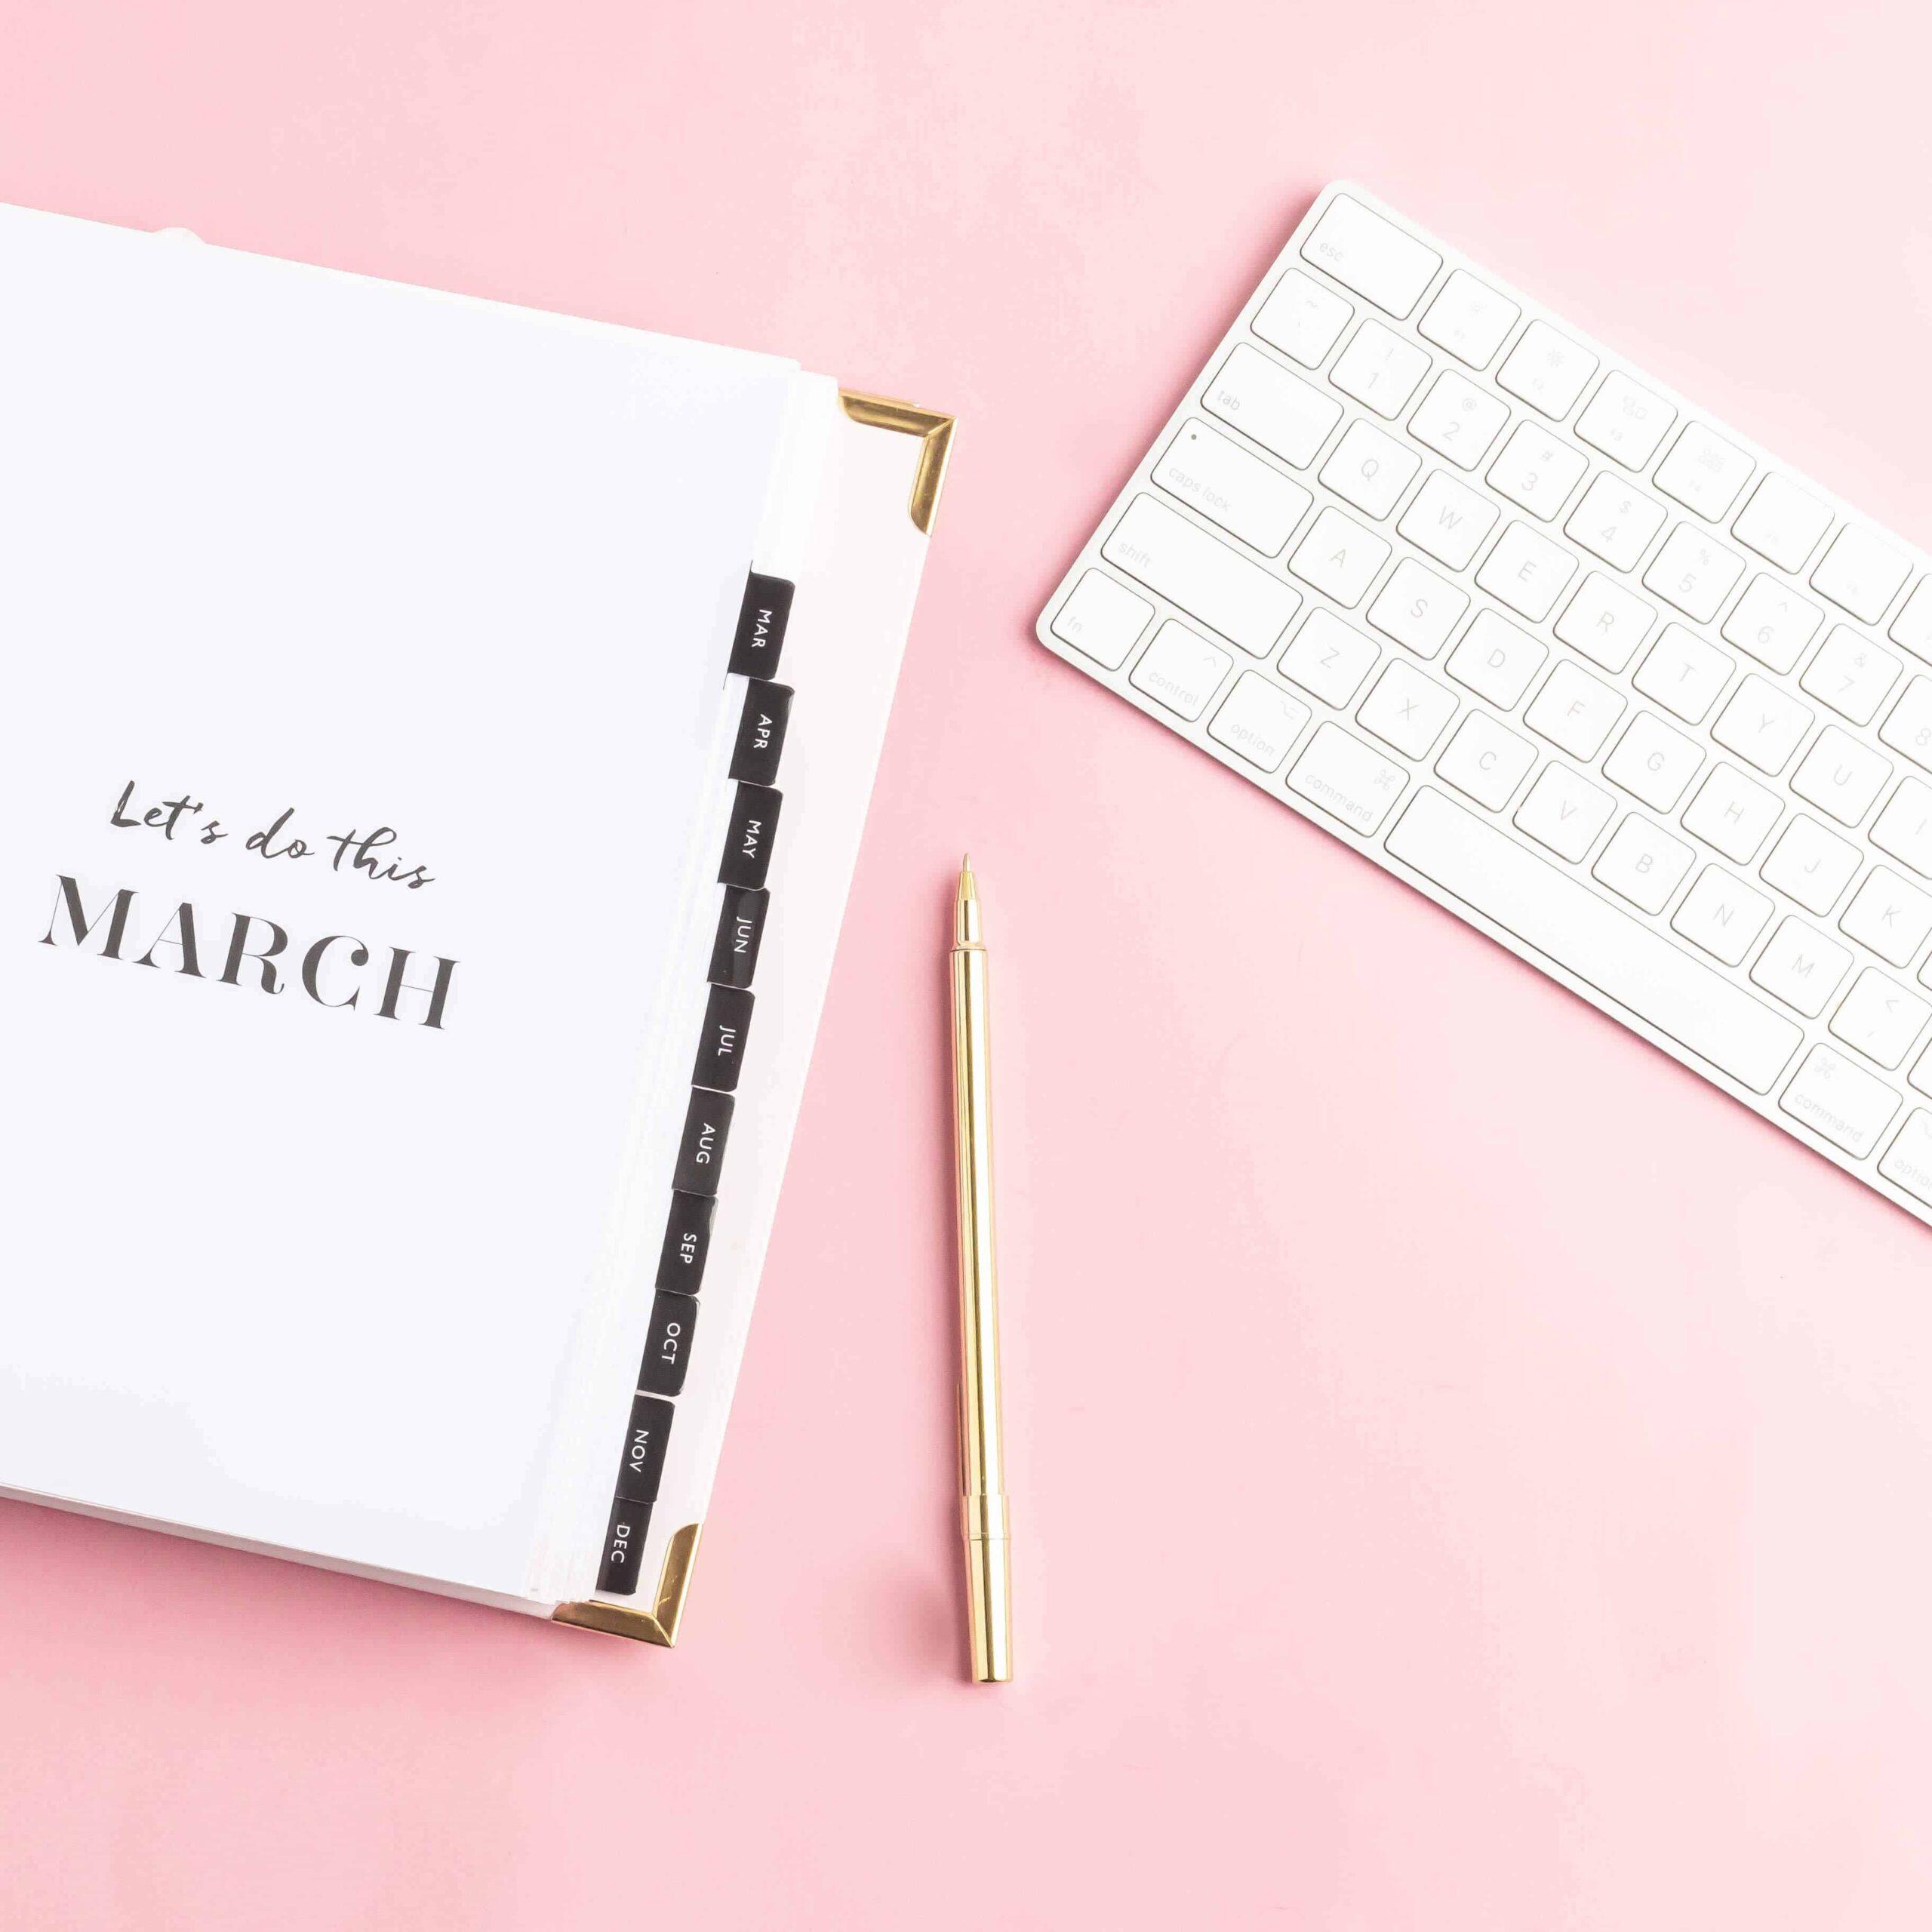 3 habits to increase productivity